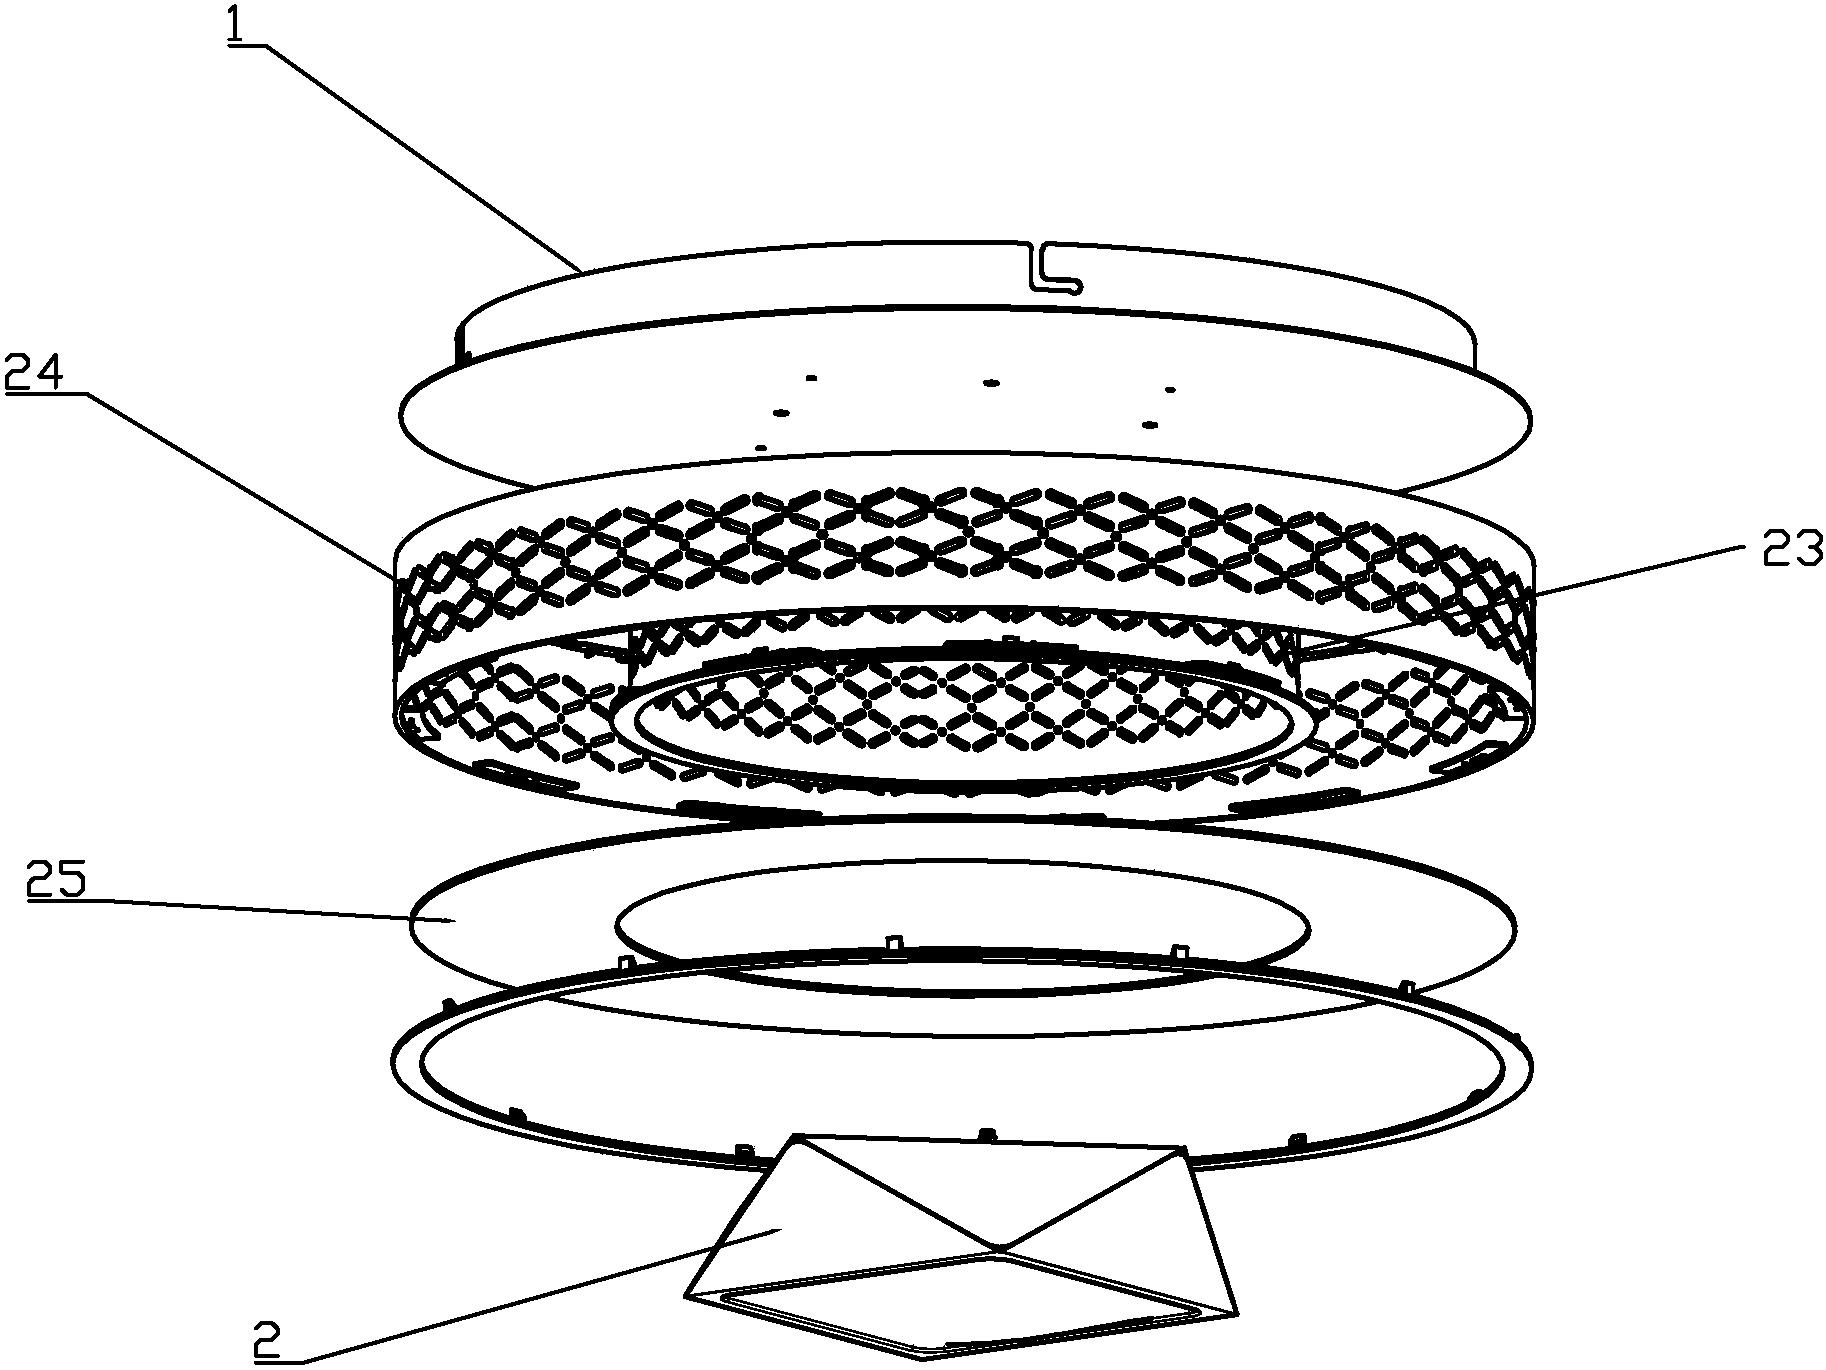 cn207065341u_一种具有组合式灯罩的吸顶灯有效